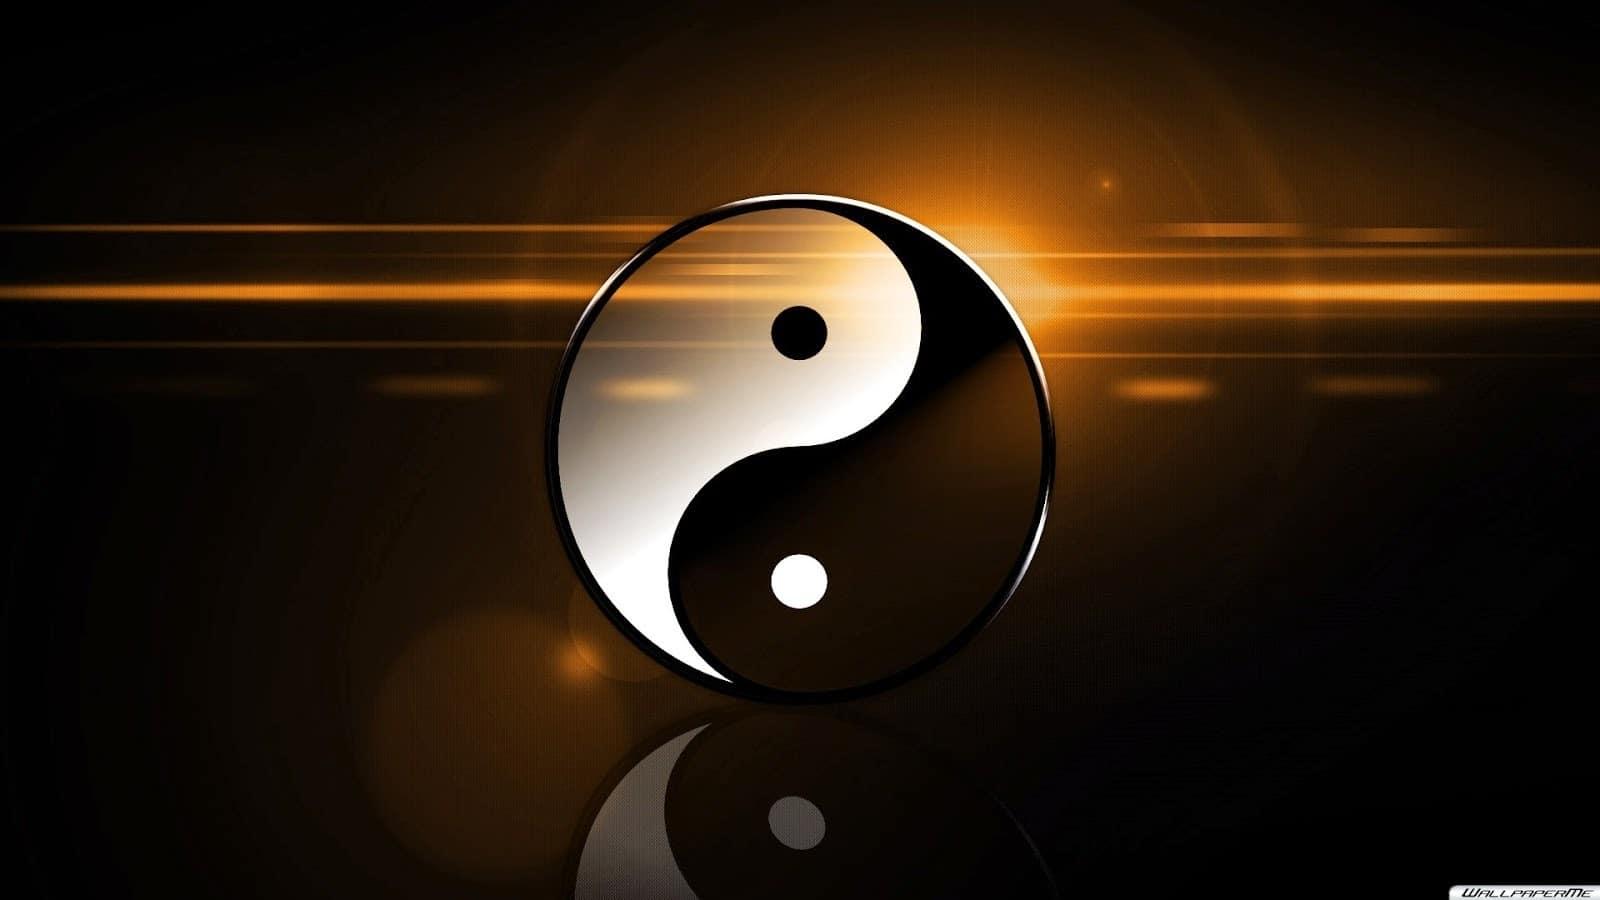 Kyusho Jitsu Yin-Yang Principle & Symbol - Understand the Deep Meaning